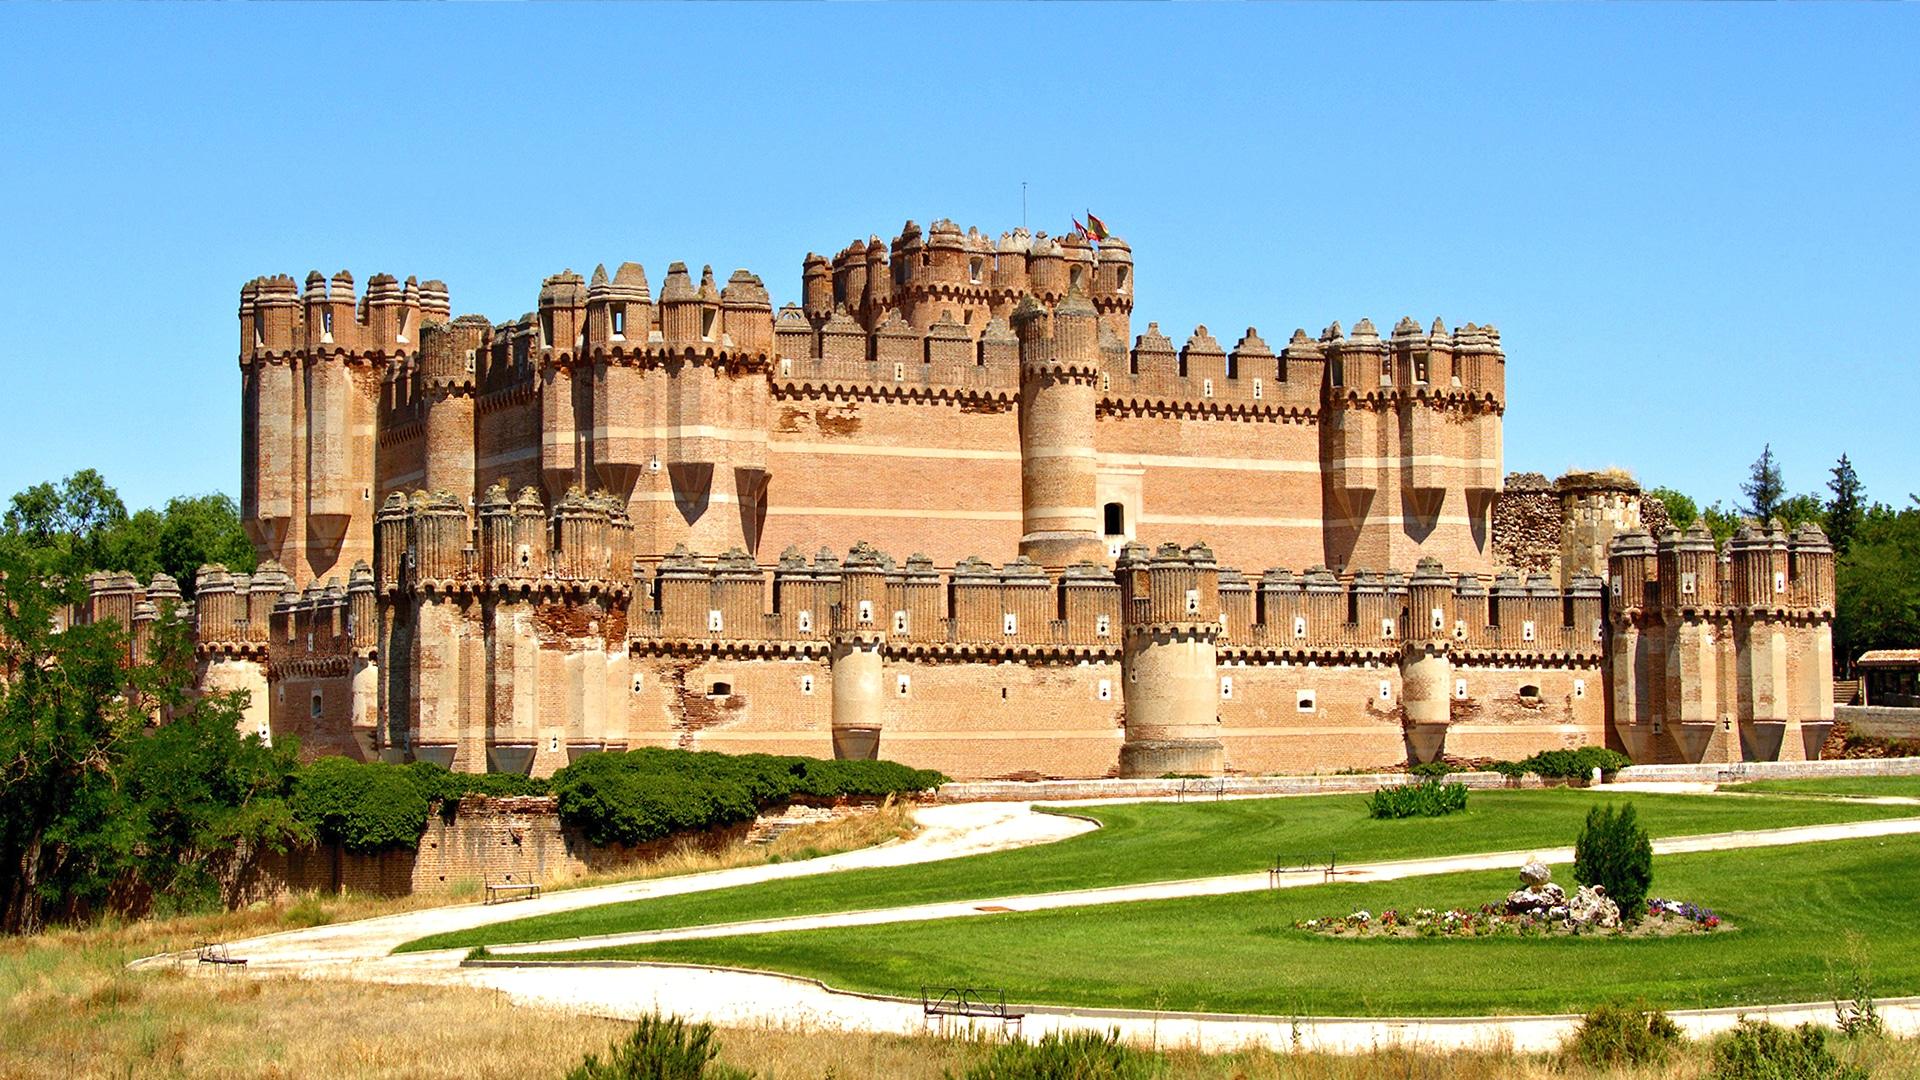 Castles_SpainInside_Coca